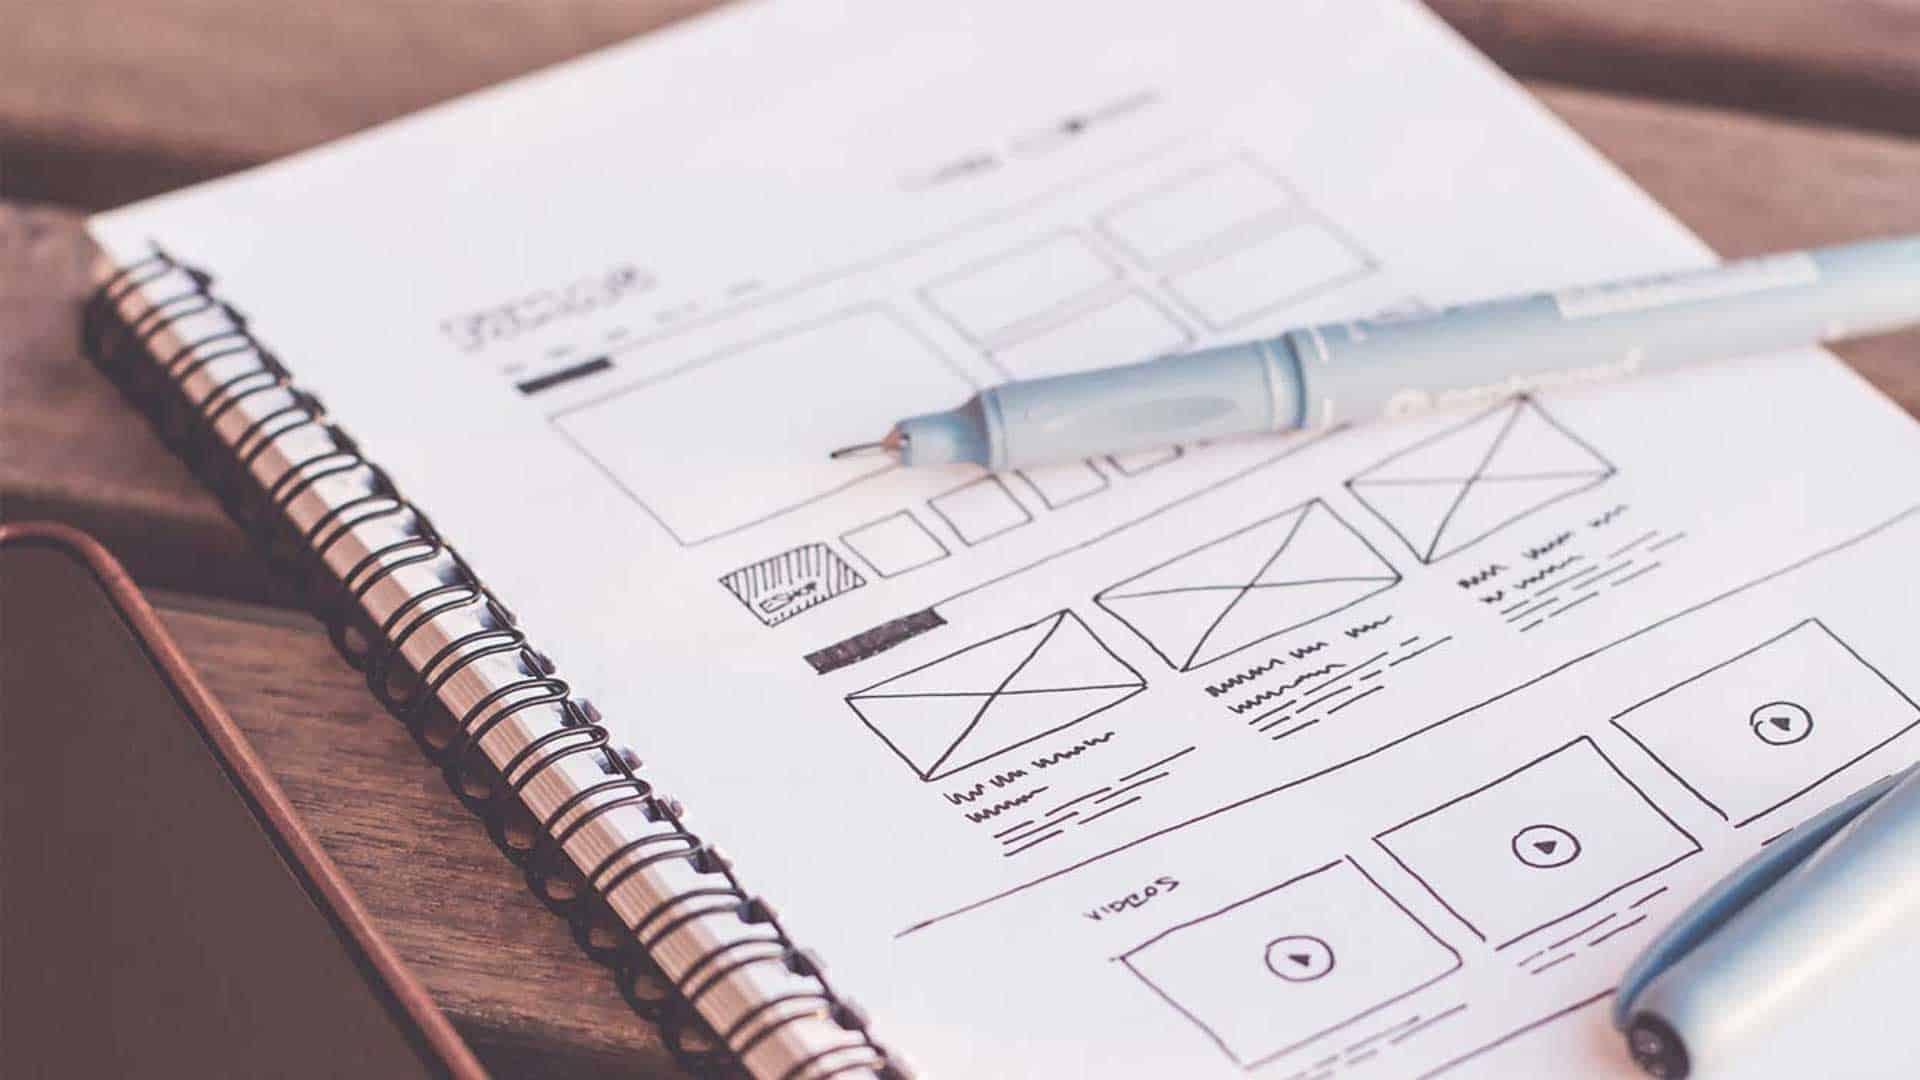 User Experience Design sketchbook